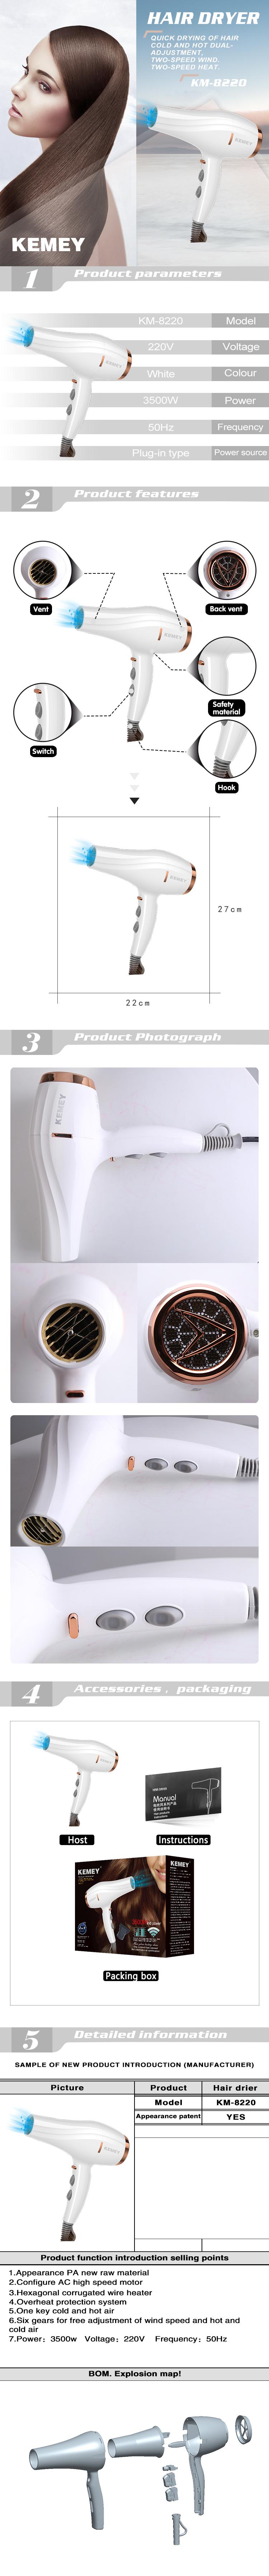 KEMEY KM-8220 3500W Professional Hair Dryer High Power Styling Tools Blow Dryer EU Plug Hairdryer 2in1